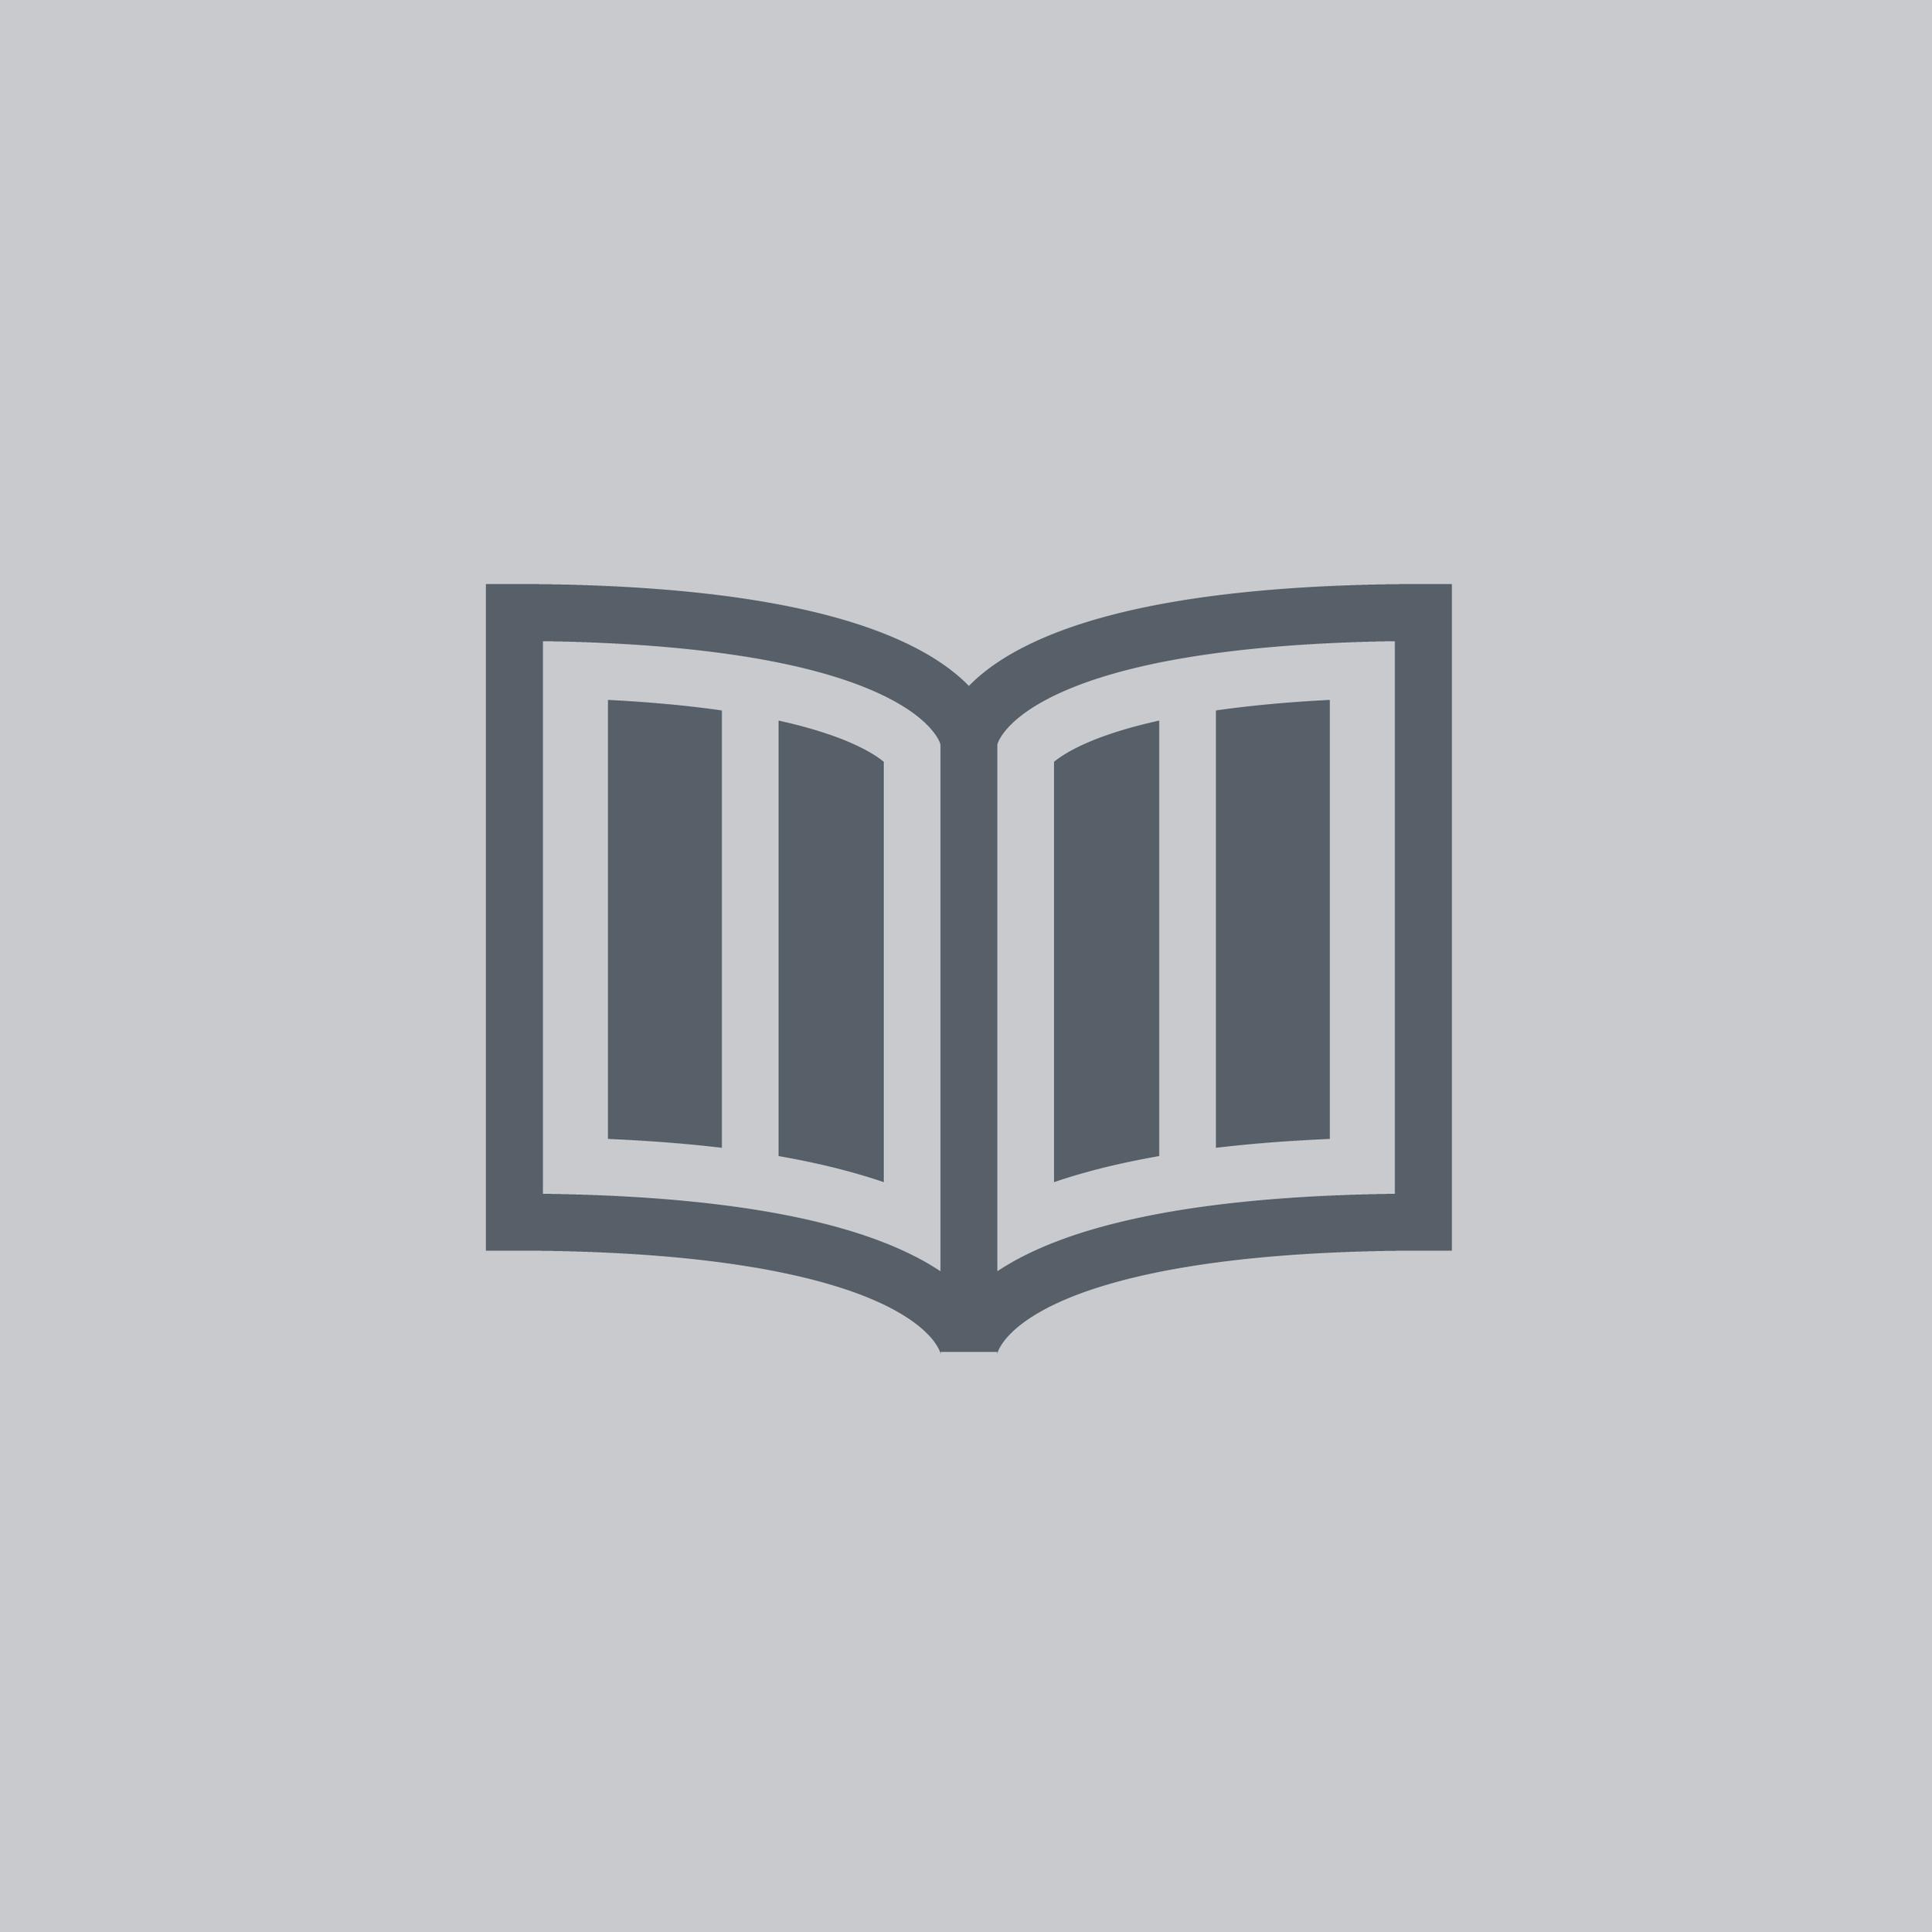 Johannes Gutenberg - Bible - Designed by Chris Cureton